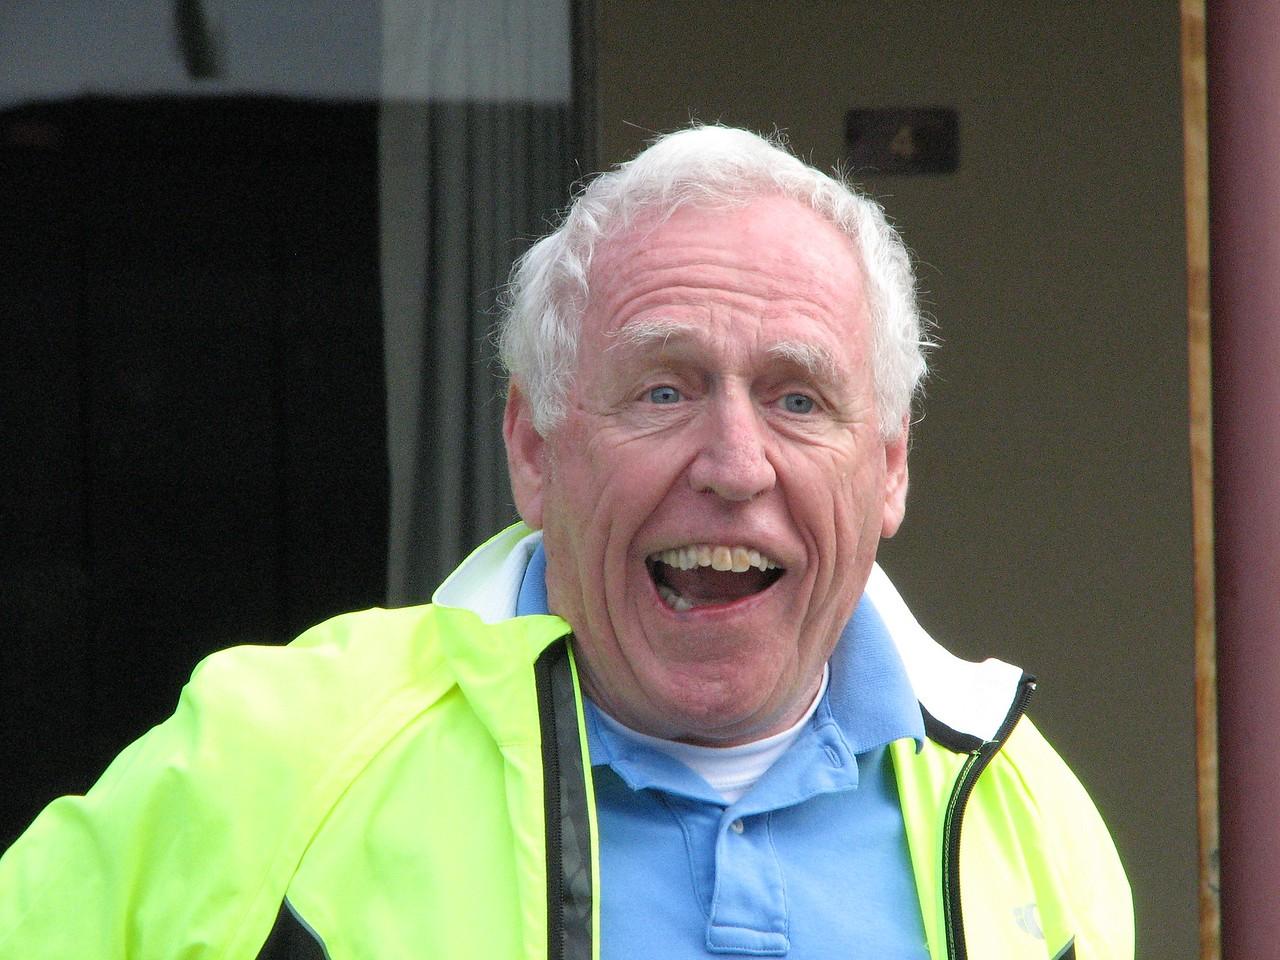 Bill Bernheim meets us in Crescent City